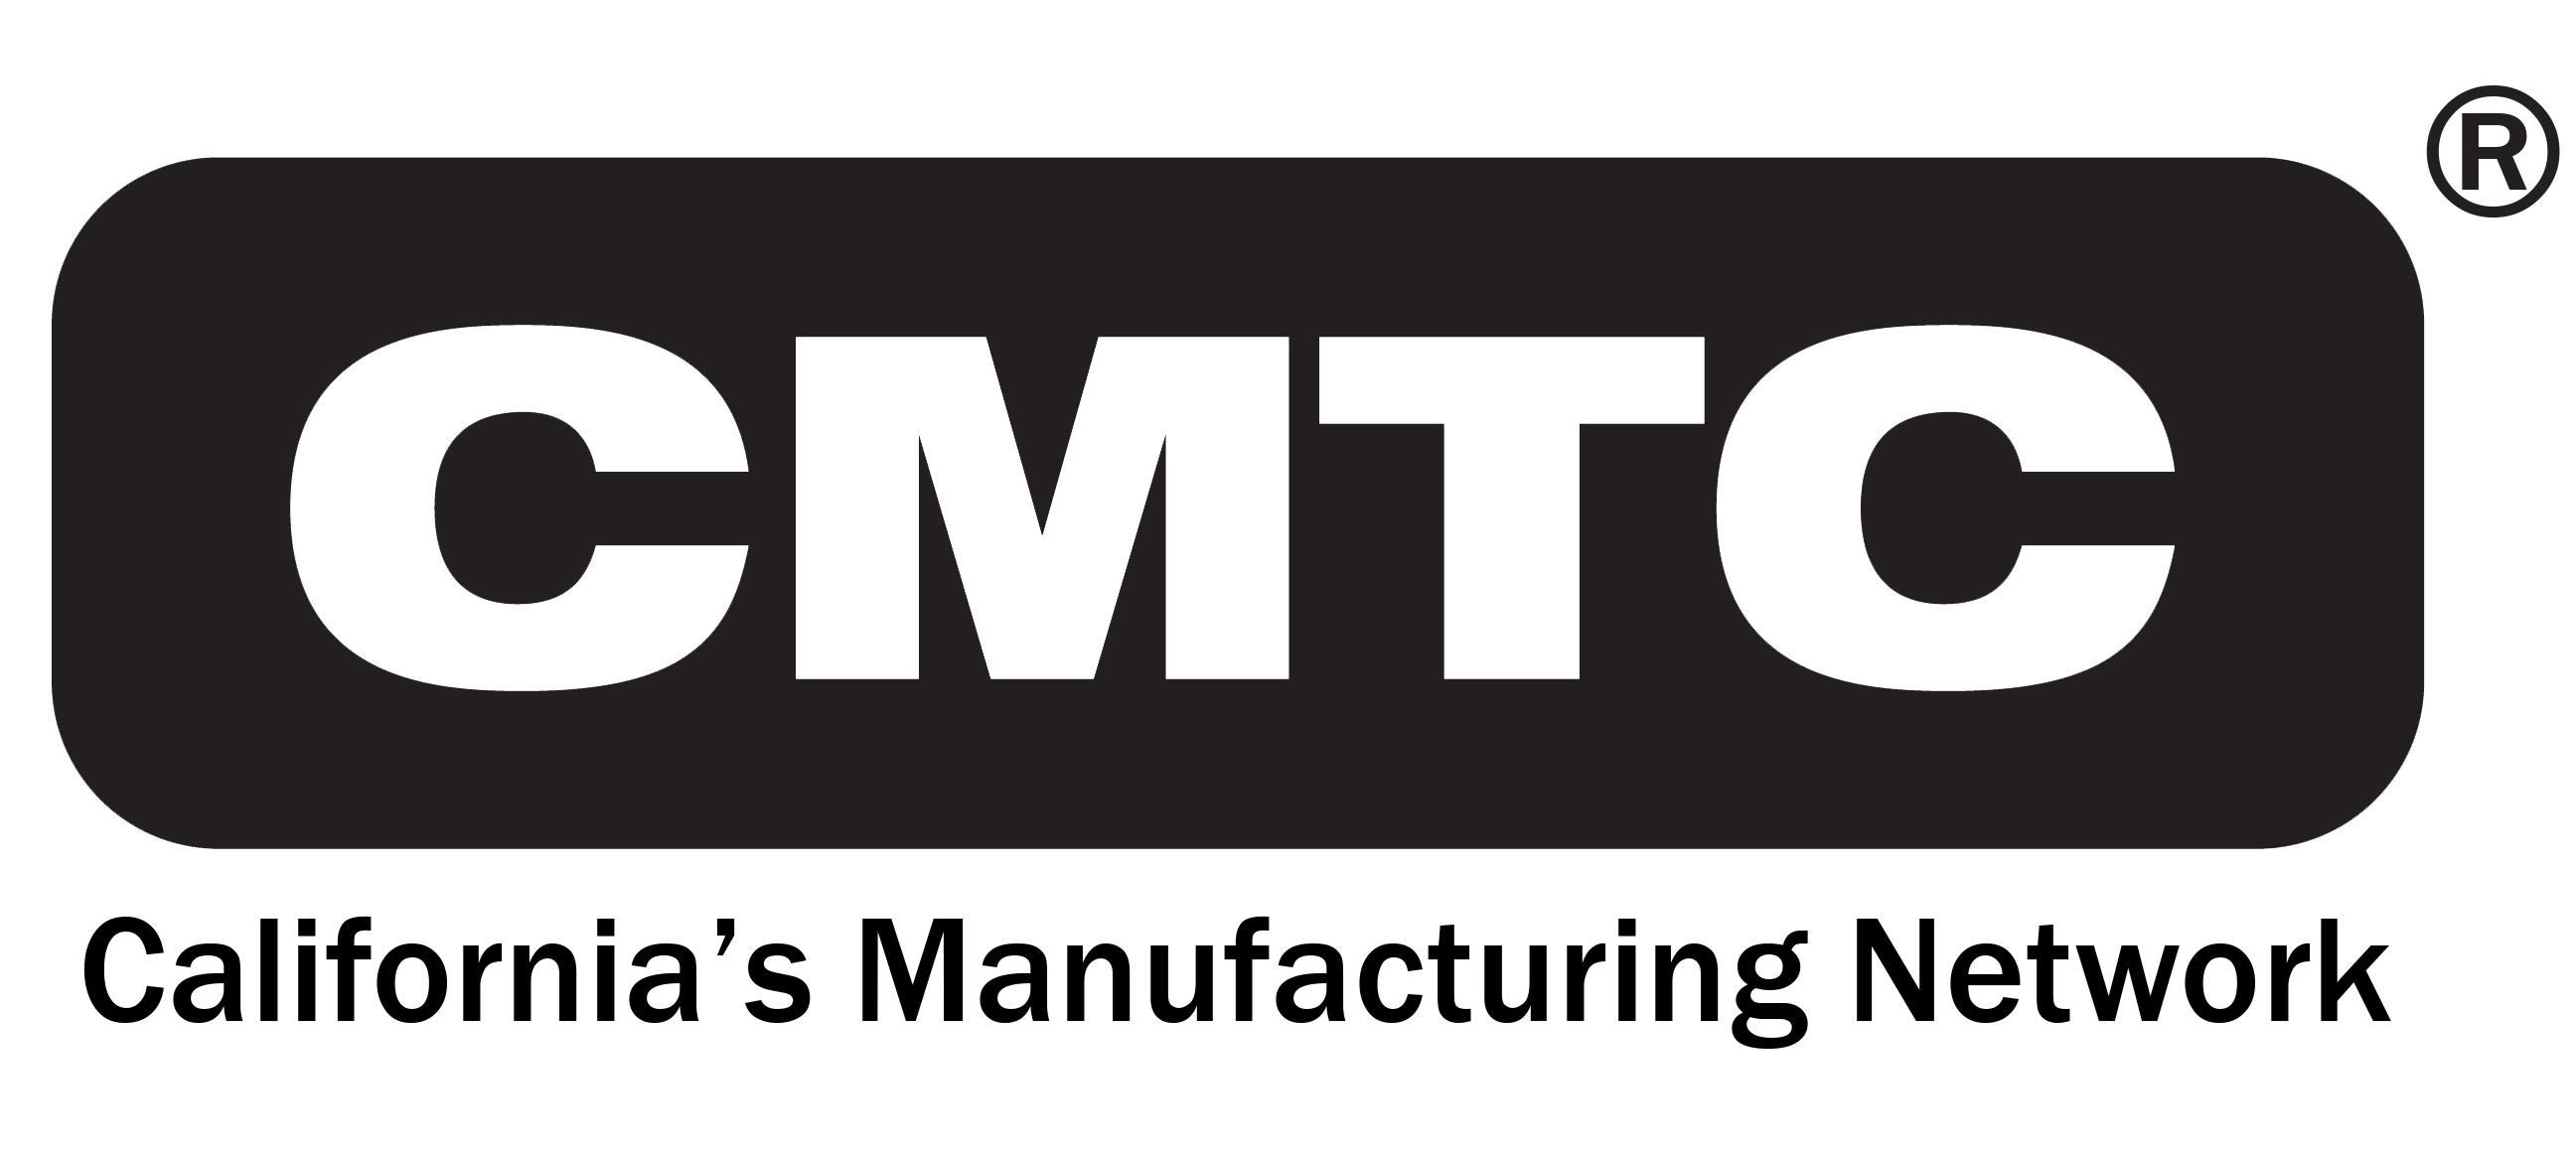 CMTC_logo_tagline.jpg